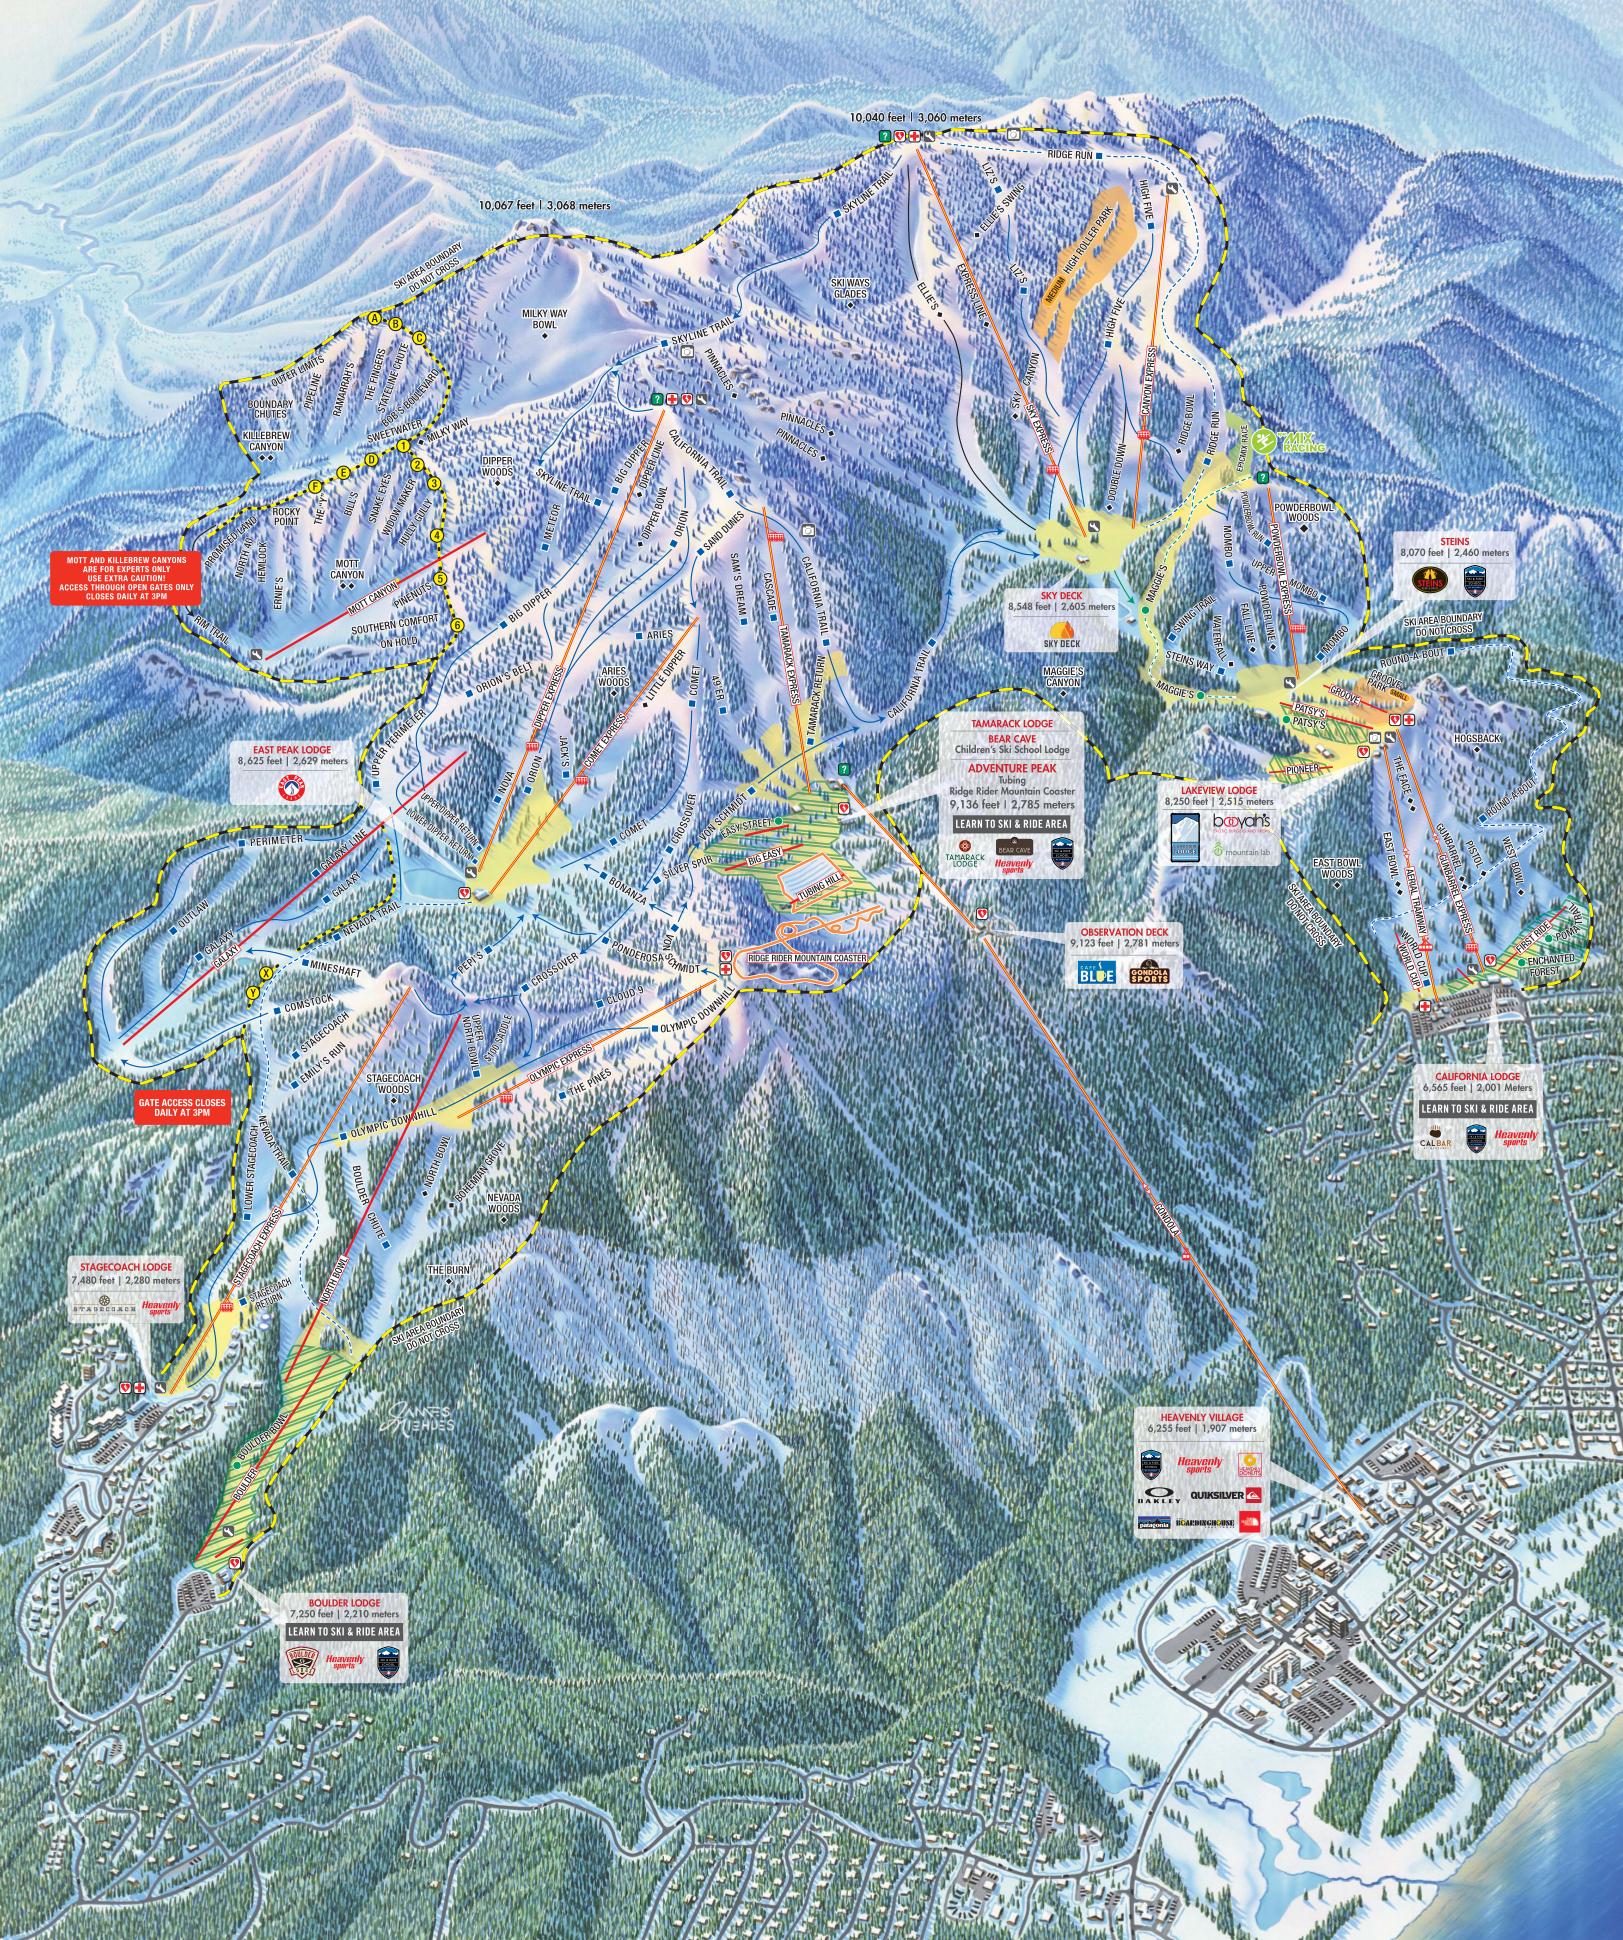 Heavenly Piste Maps - Landscape map of usa